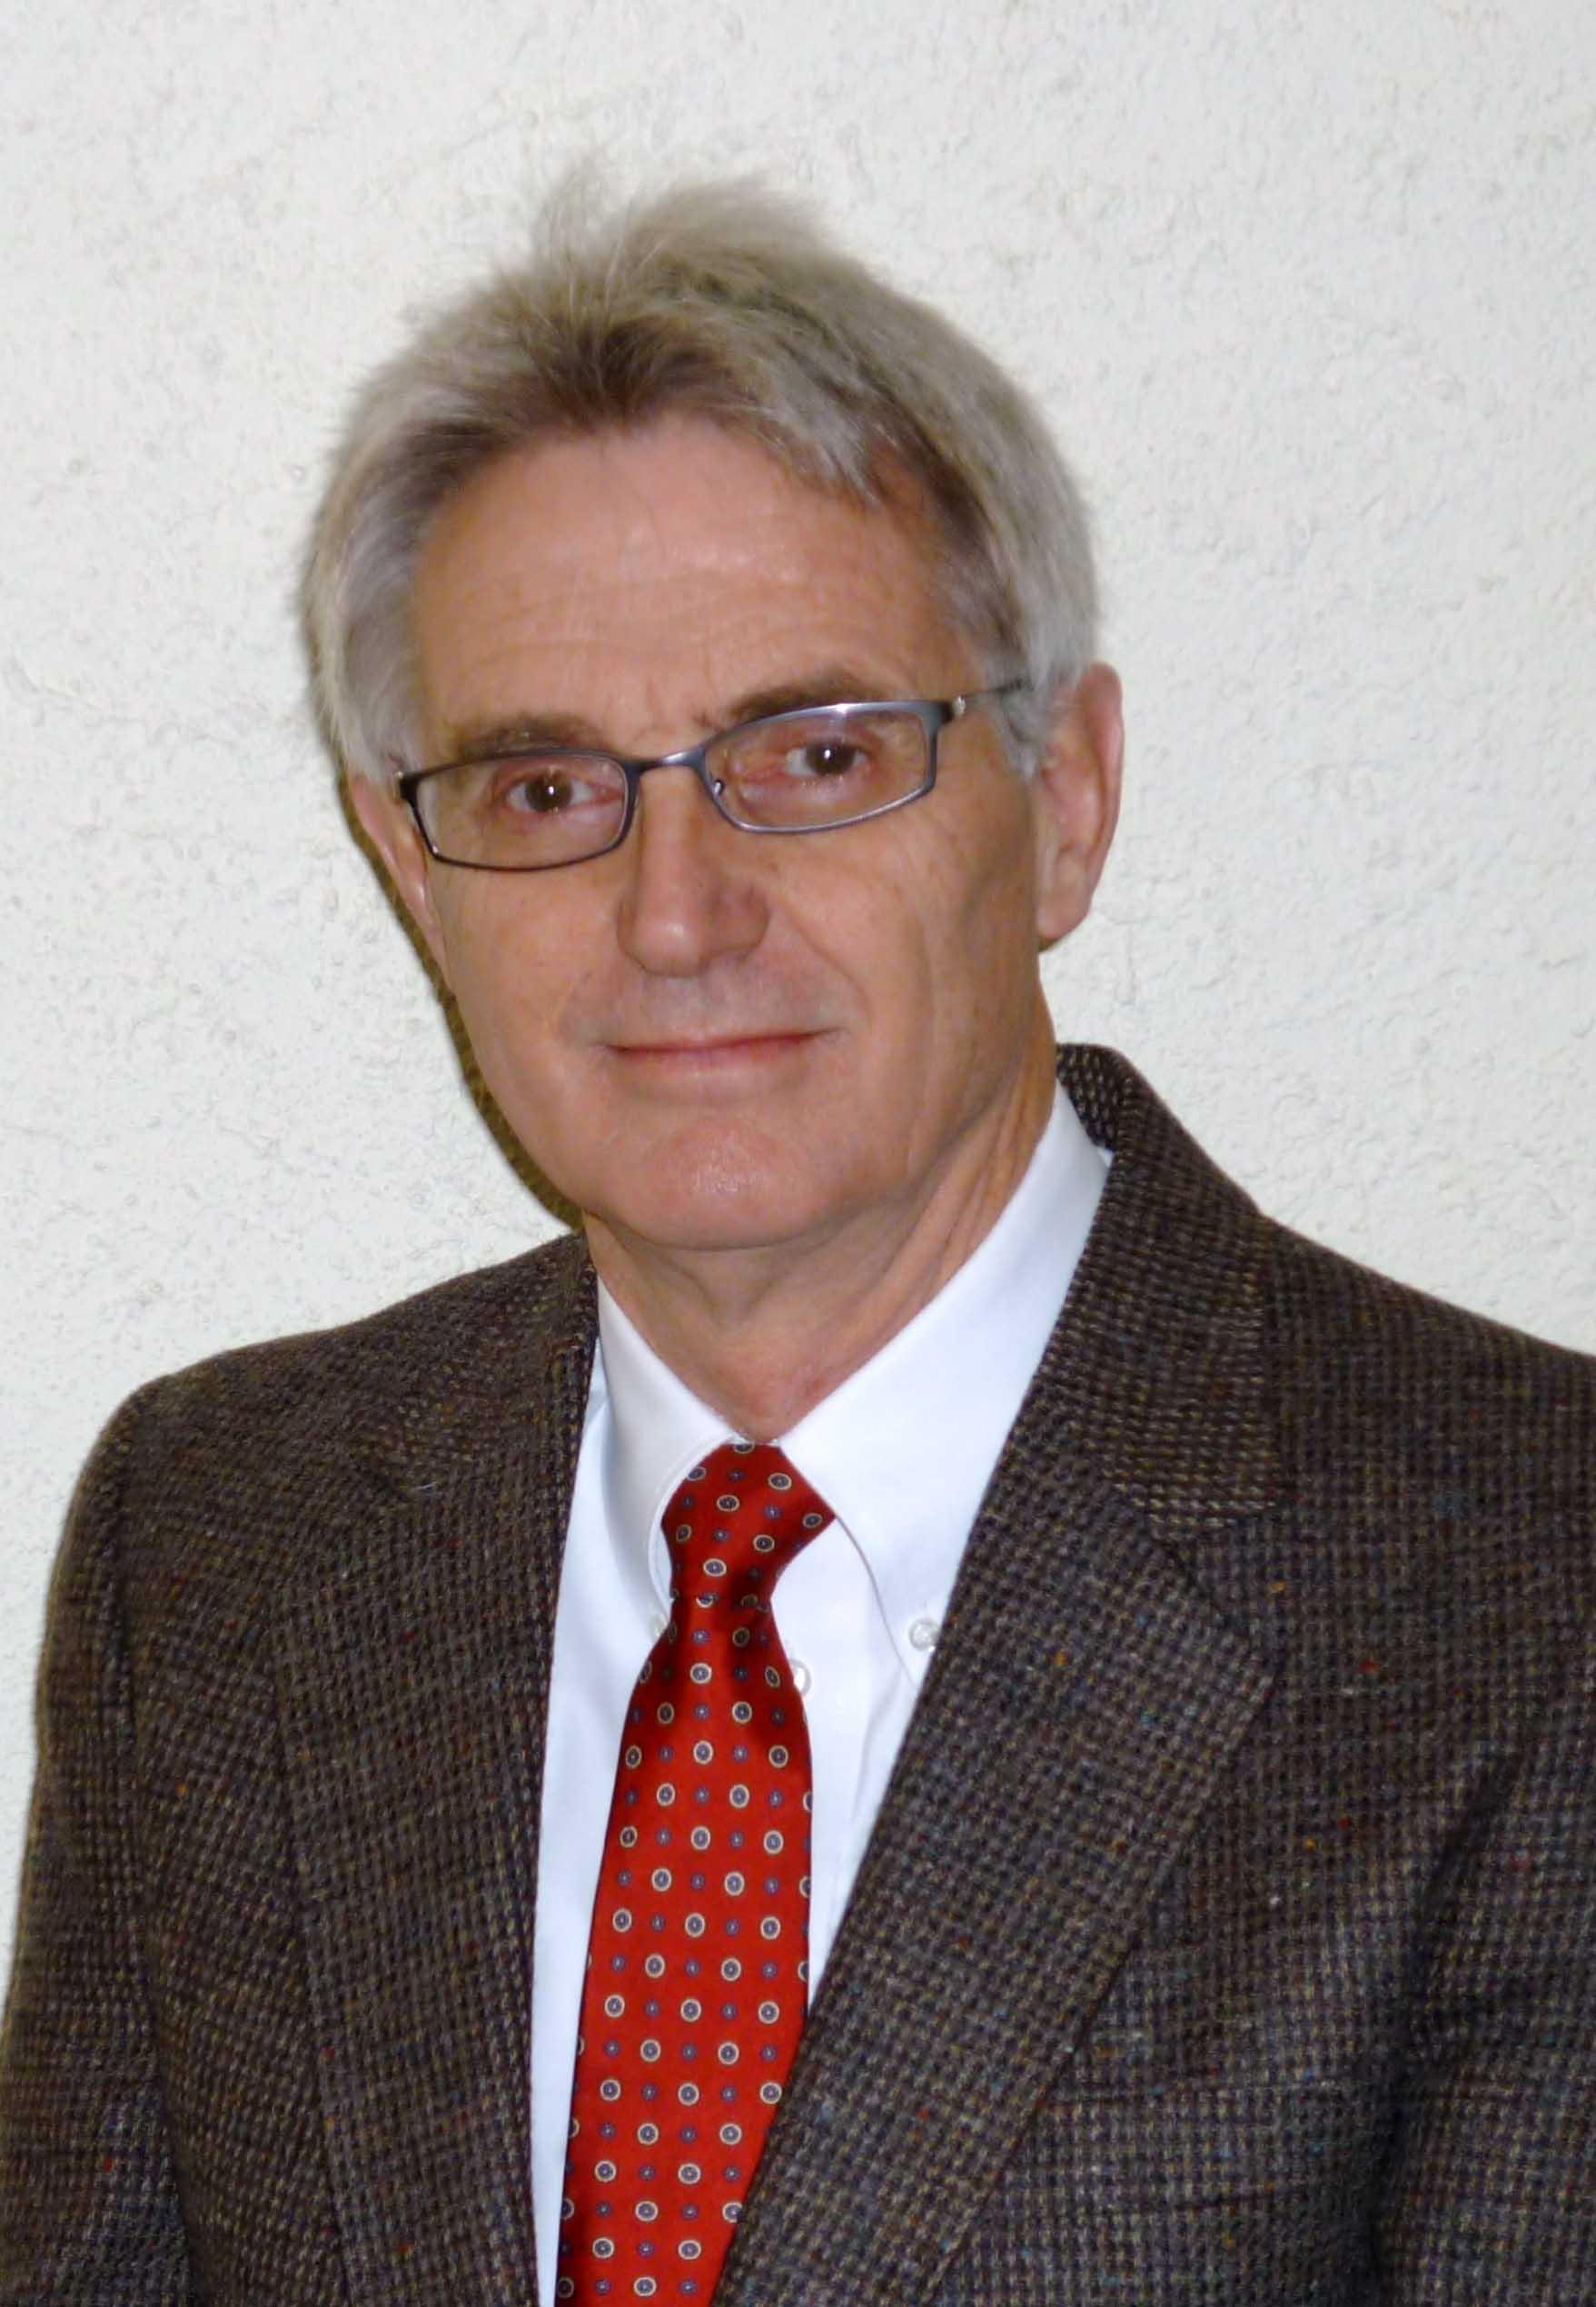 GREGORY OESTREICH